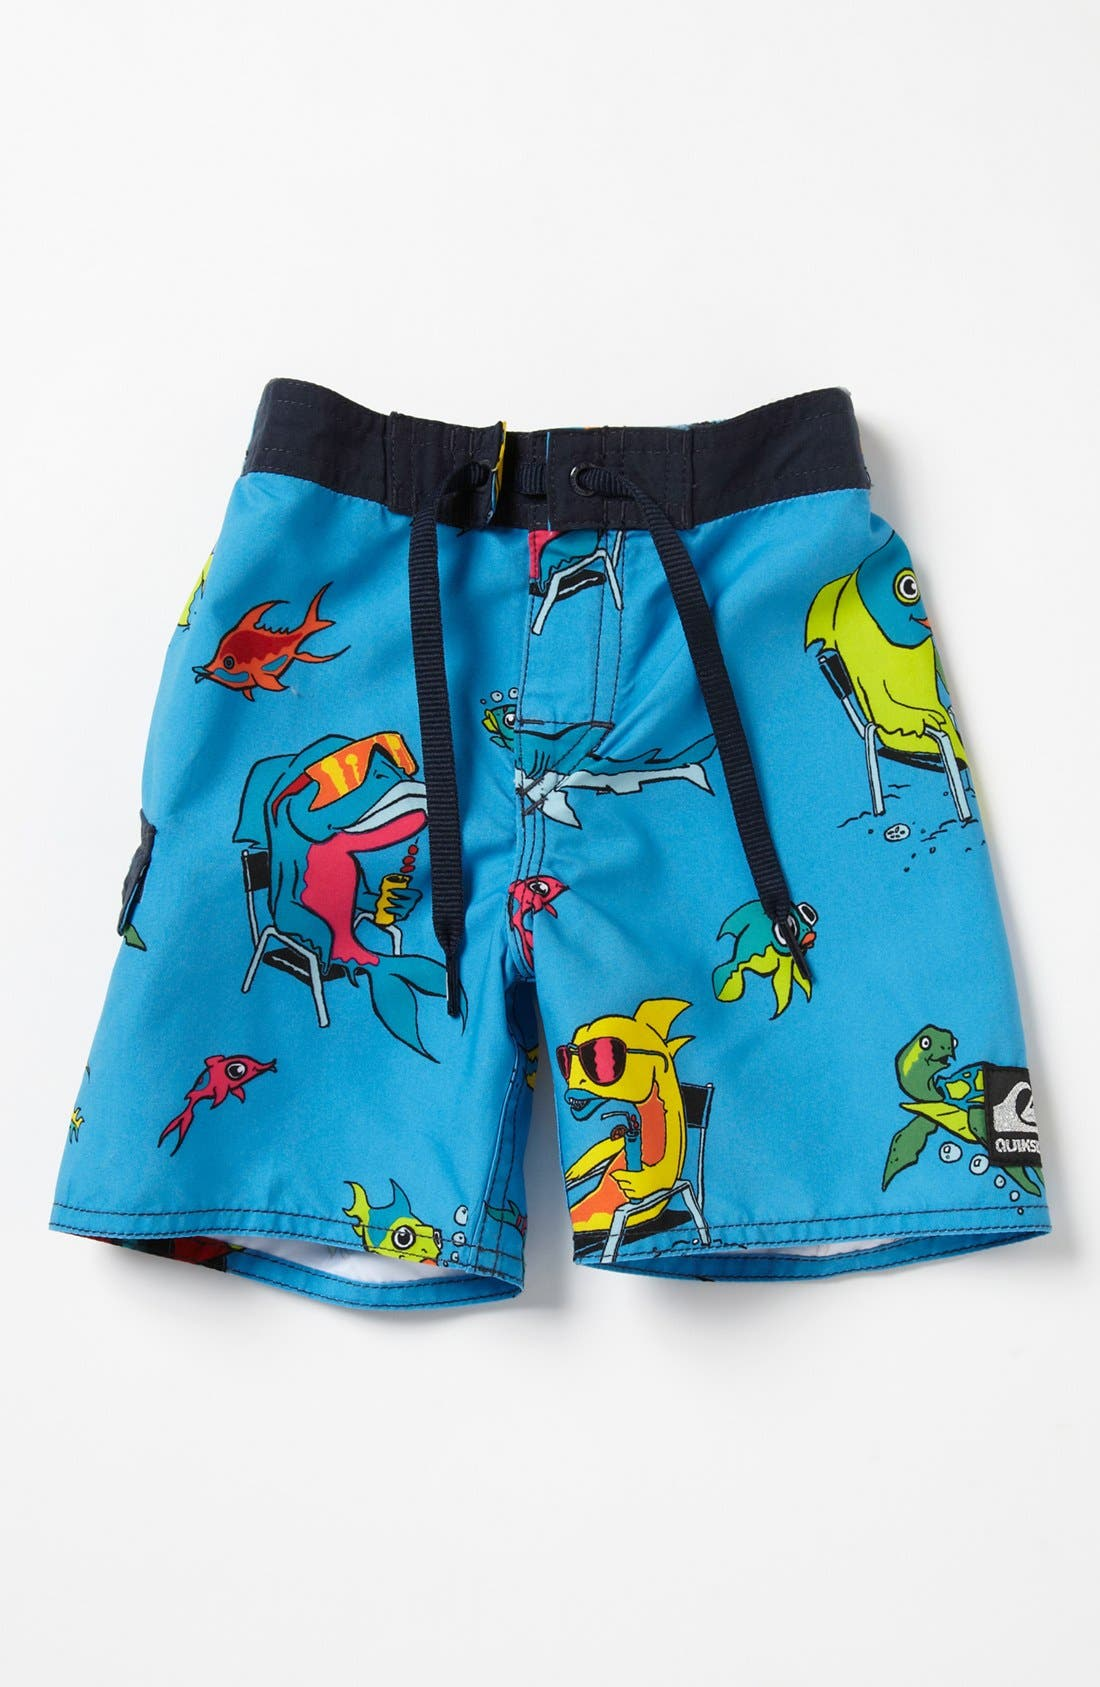 Main Image - Quiksilver 'Fish Tacoz' Board Shorts (Baby Boys)